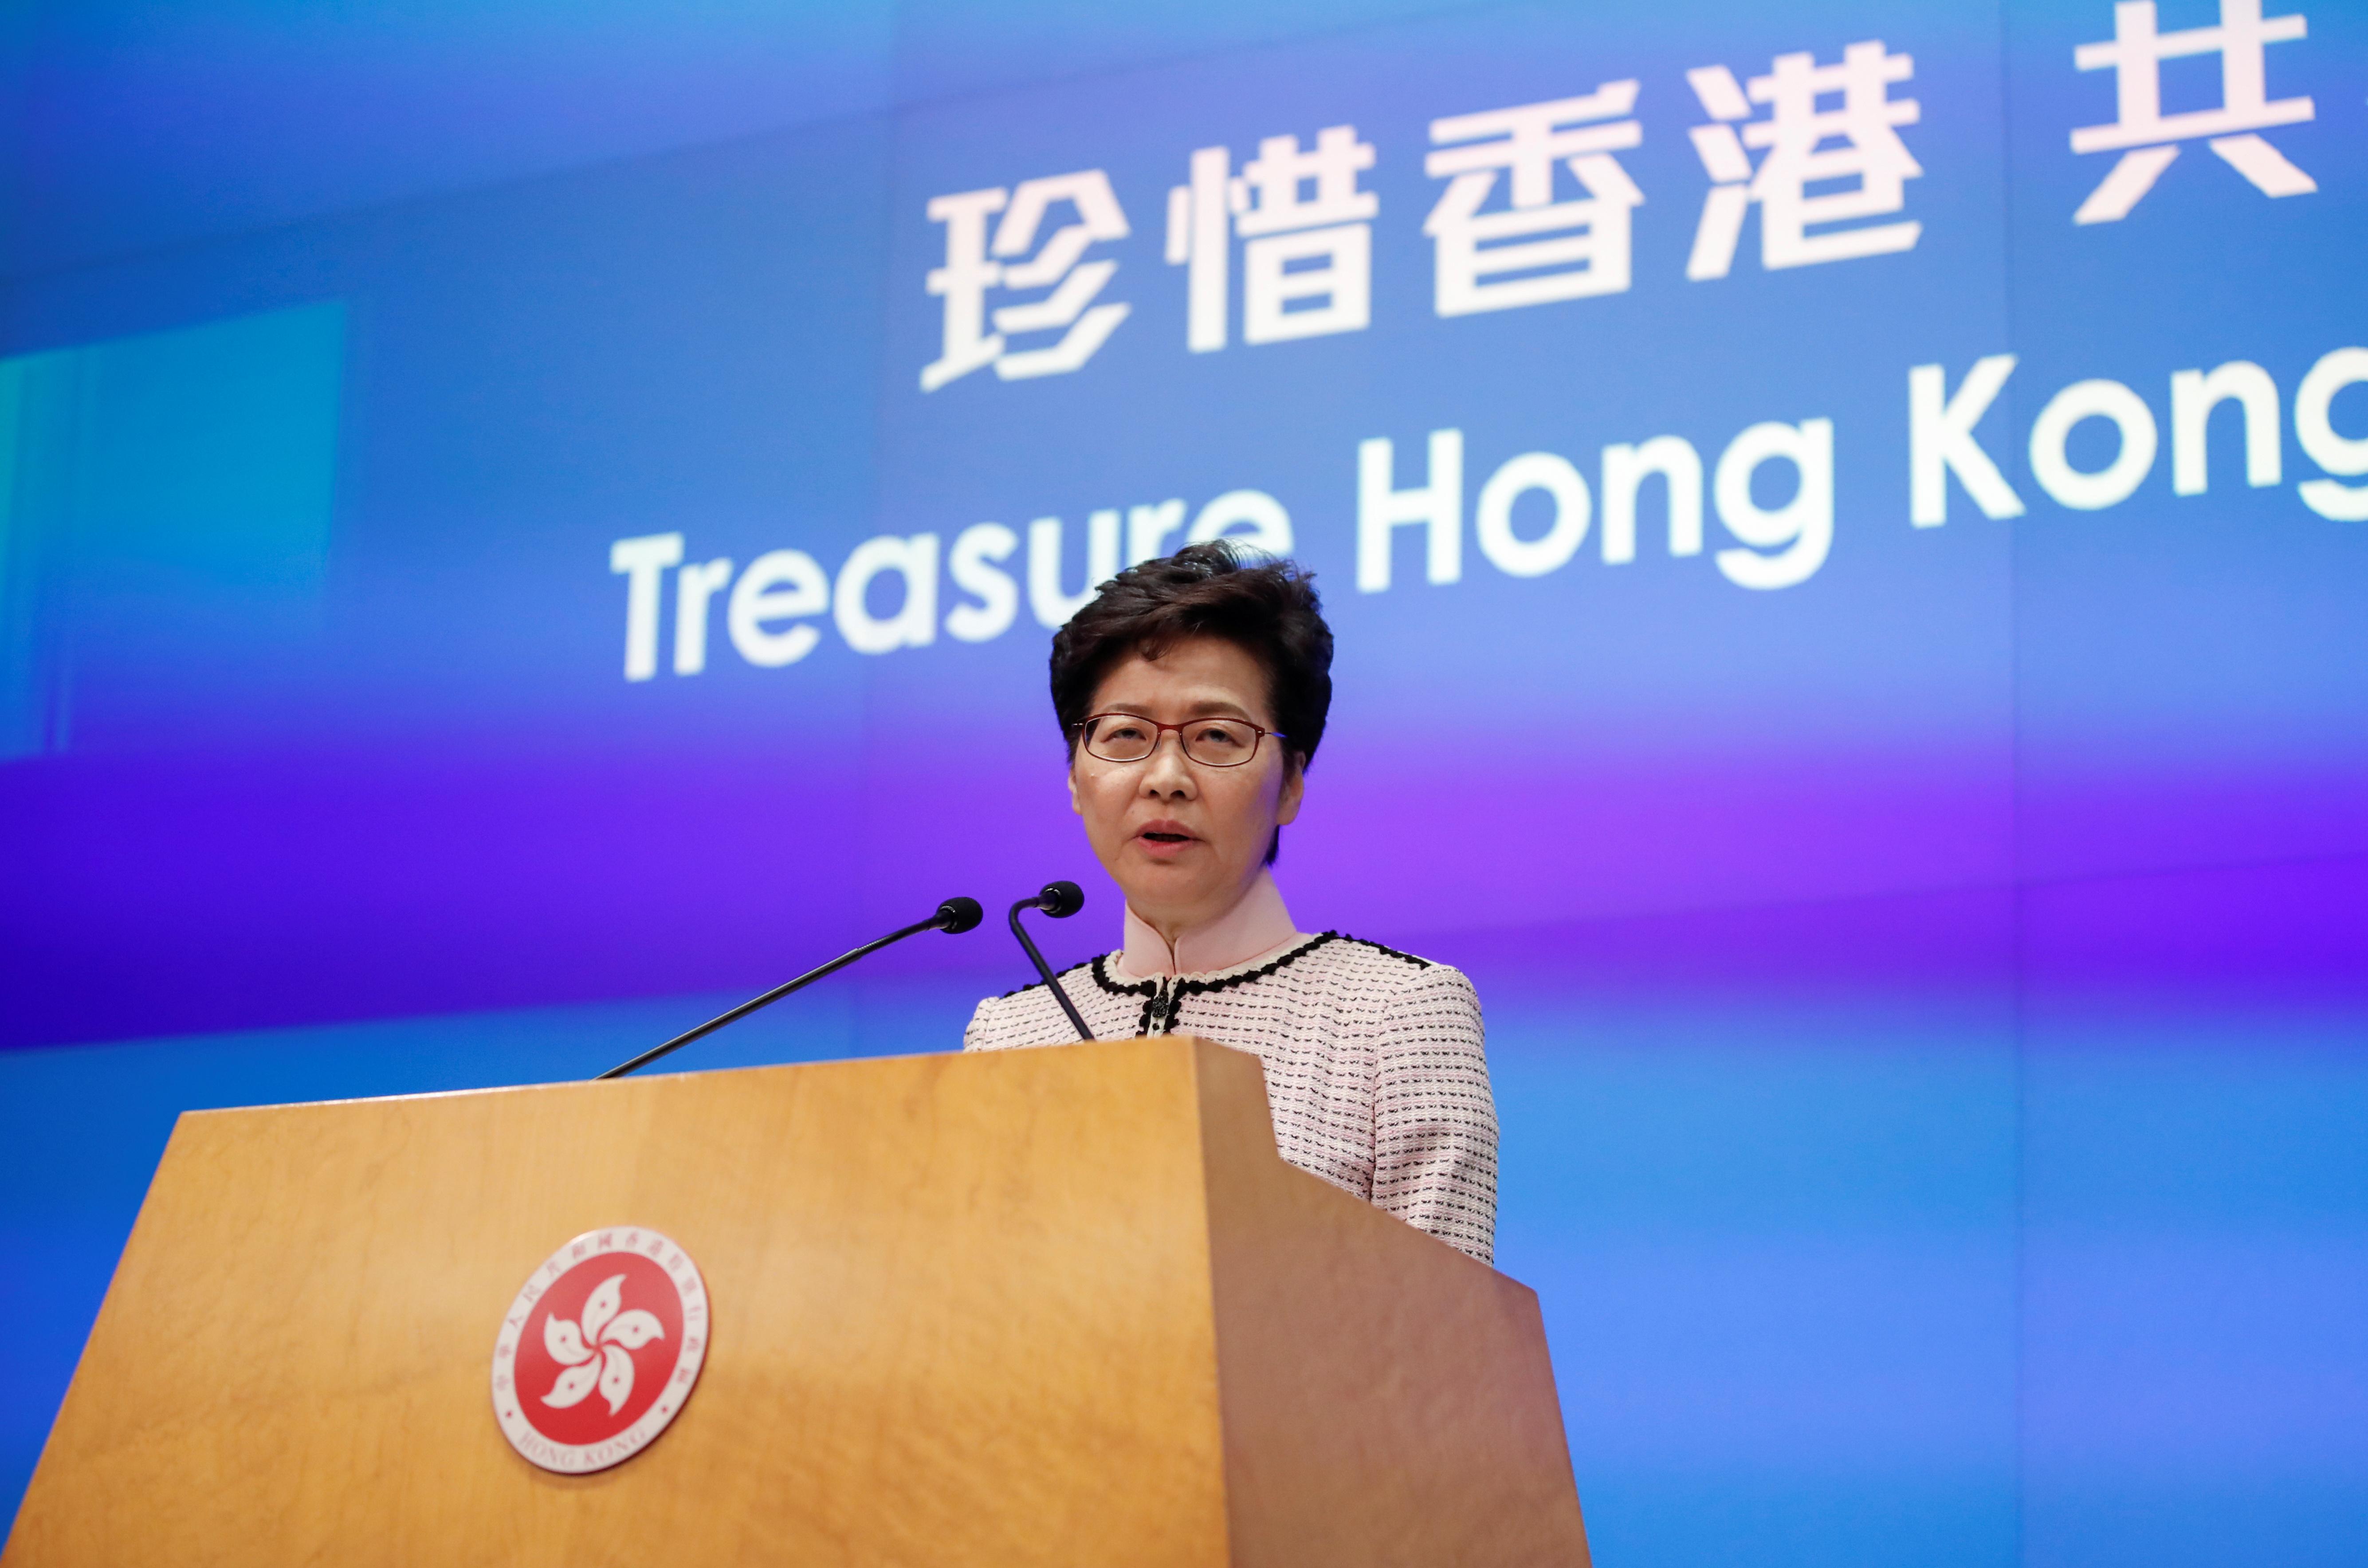 Hong Kong leader says city's status as financial hub not shaken